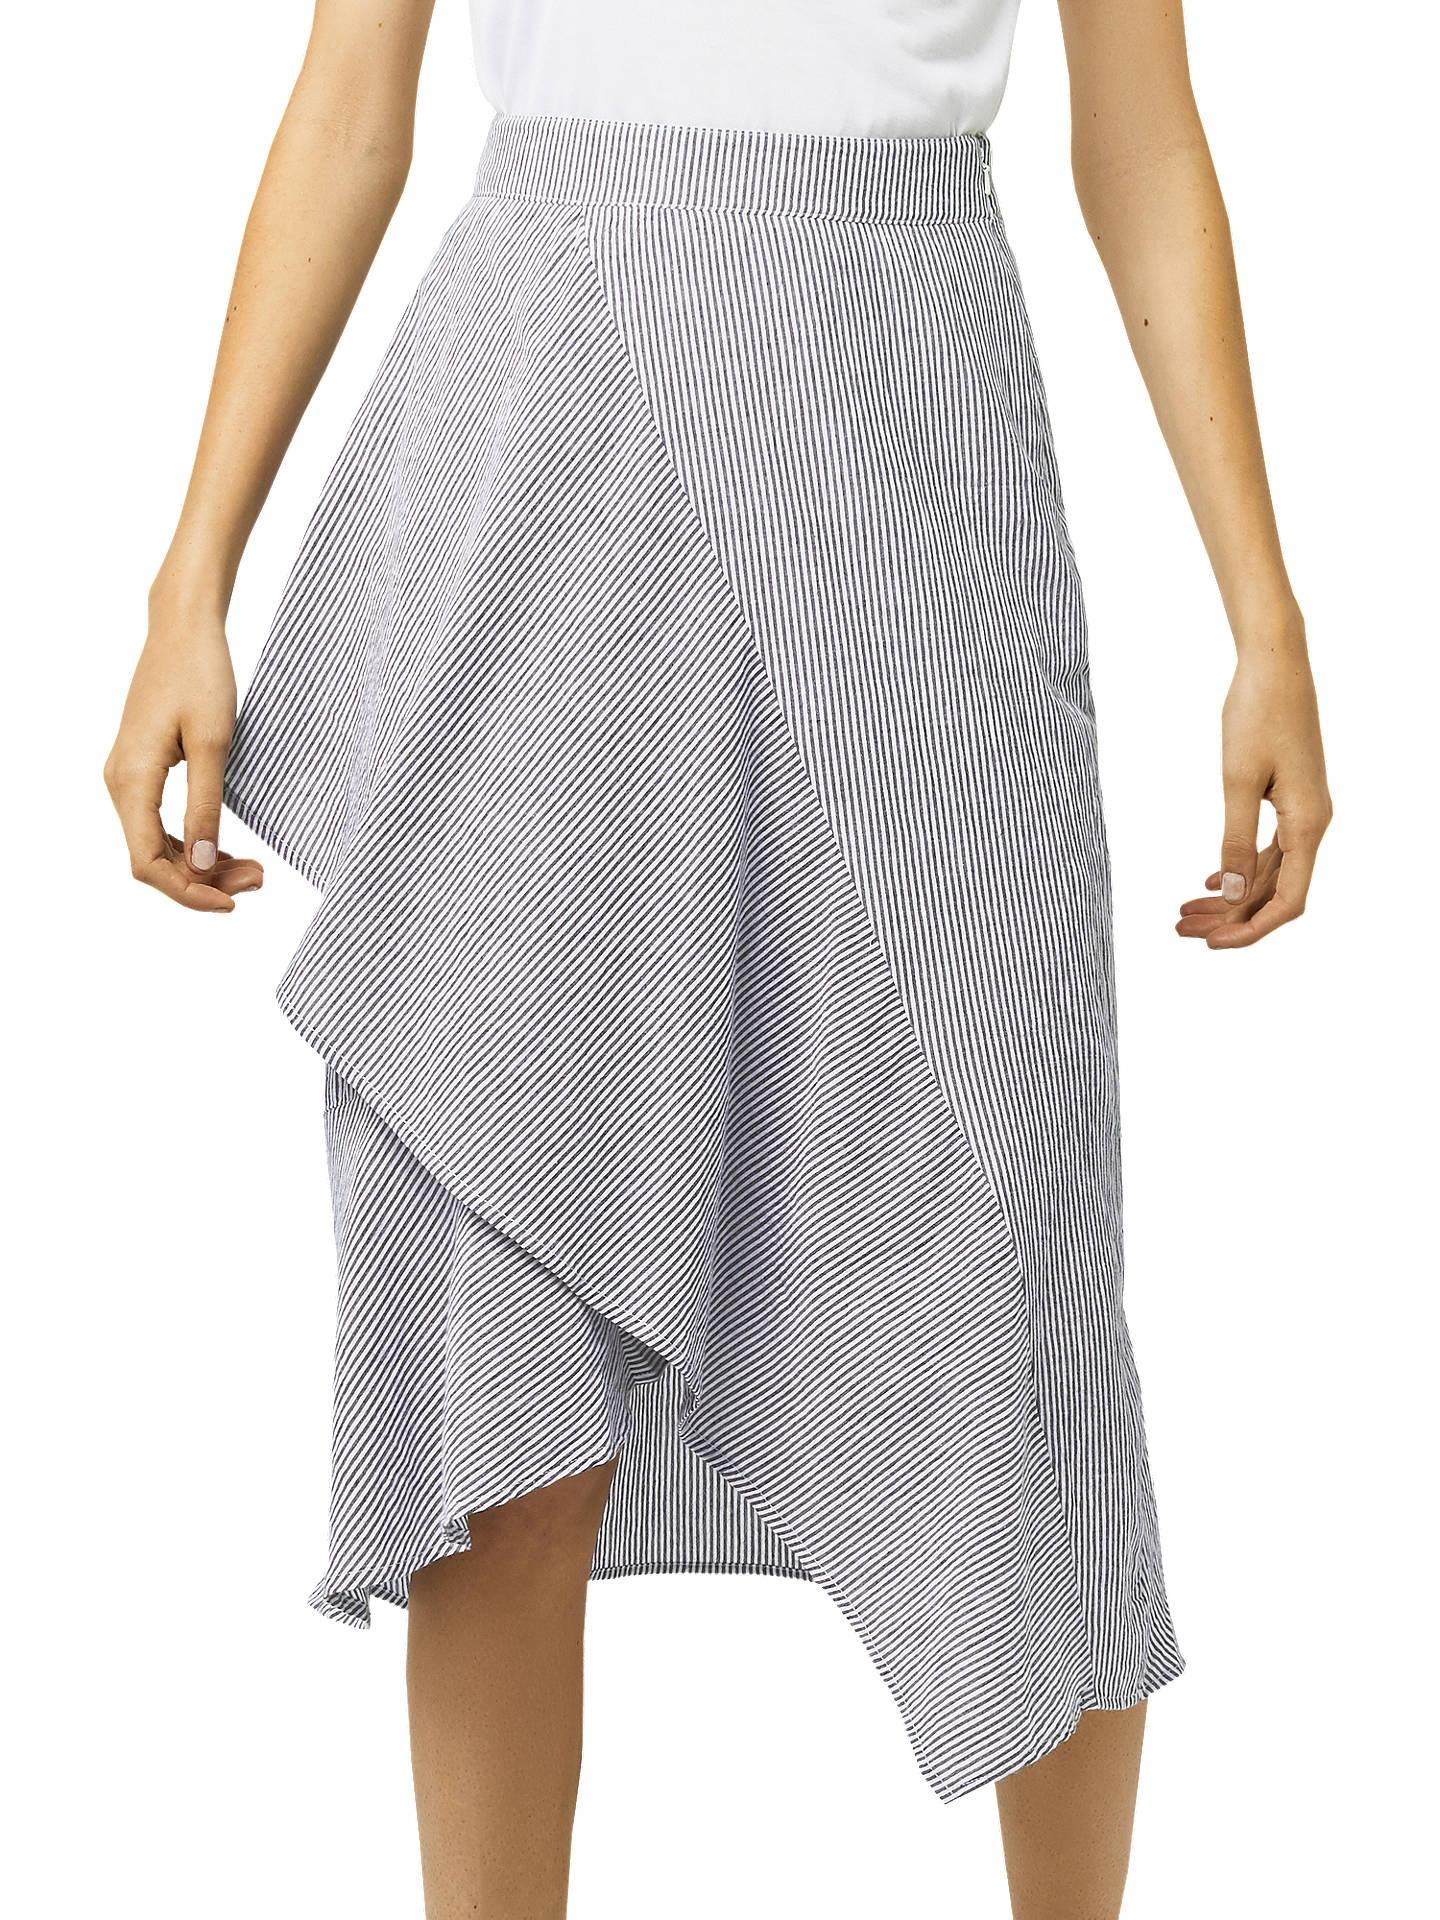 b655aea72 Buy Warehouse Ruffle Asymmetric Midi Skirt, Grey Stripe, 6 Online at  johnlewis.com ...